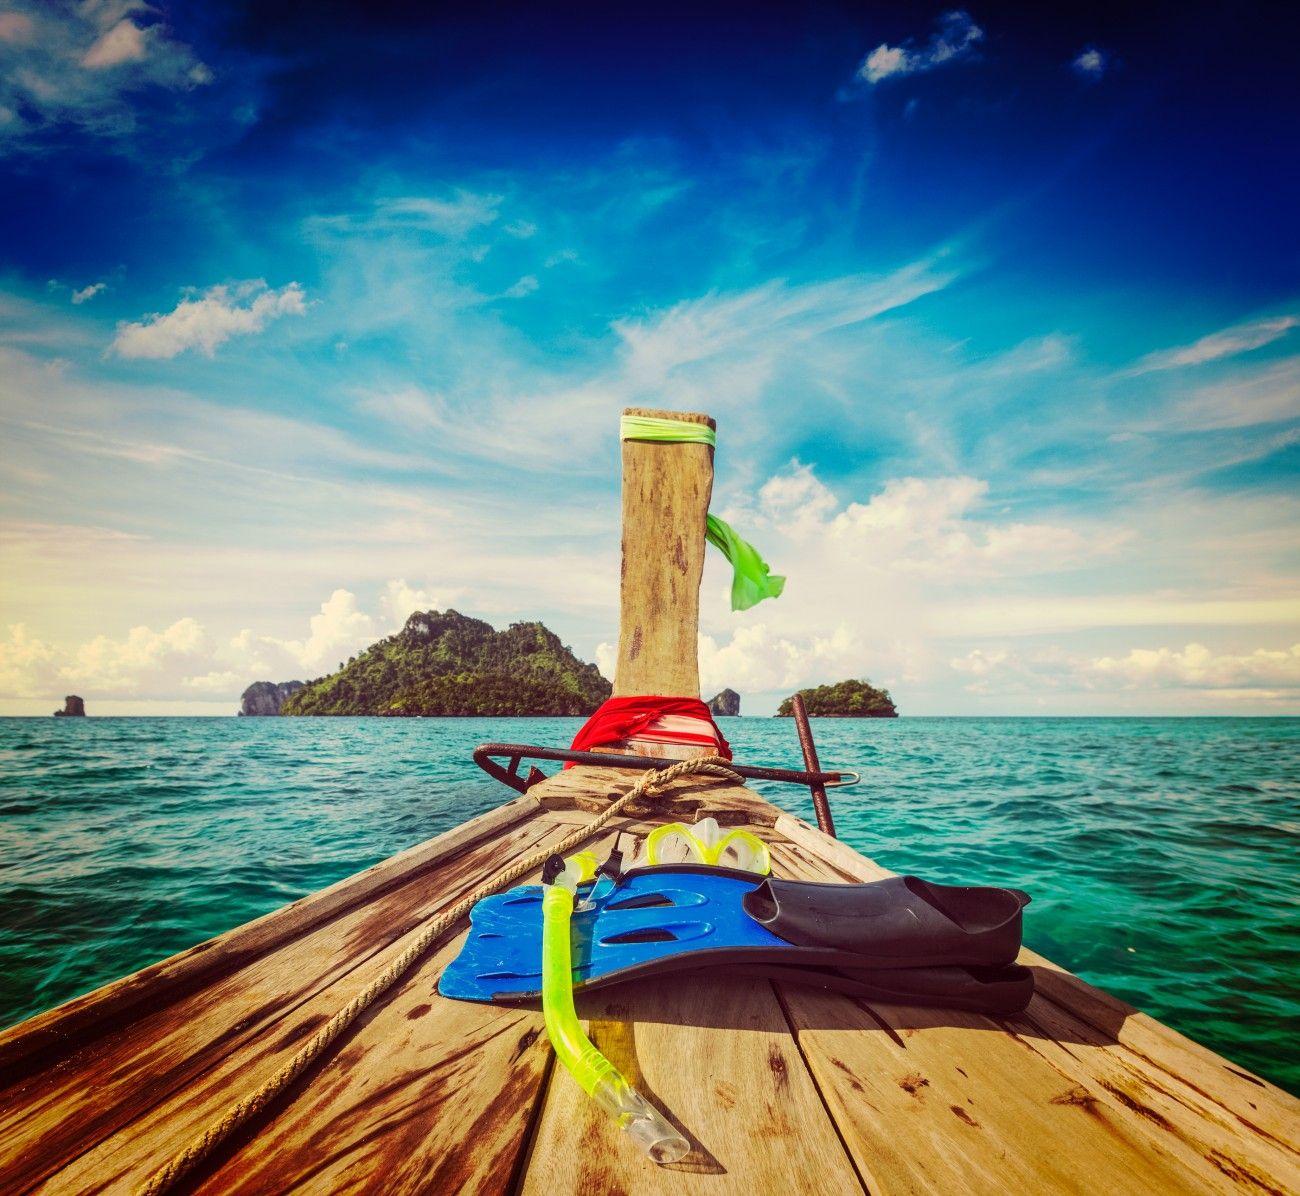 Walaupun masuk ke dalam wilayah DKI Jakarta, mungkin masih banyak dari kamu yang belum pernah menjelajahi Kepulauan Seribu. Padahal banyak pulau-pulau kecil yang indah dan masih cukup terjaga kelestariannya dan salah satunya adalah Pulau Dolphin. Masih ragu? Coba cek video yang ada di bagian atas artikel ini! Video berjudul 'Main-main ke Pulau Dolphin' yang diunggah …